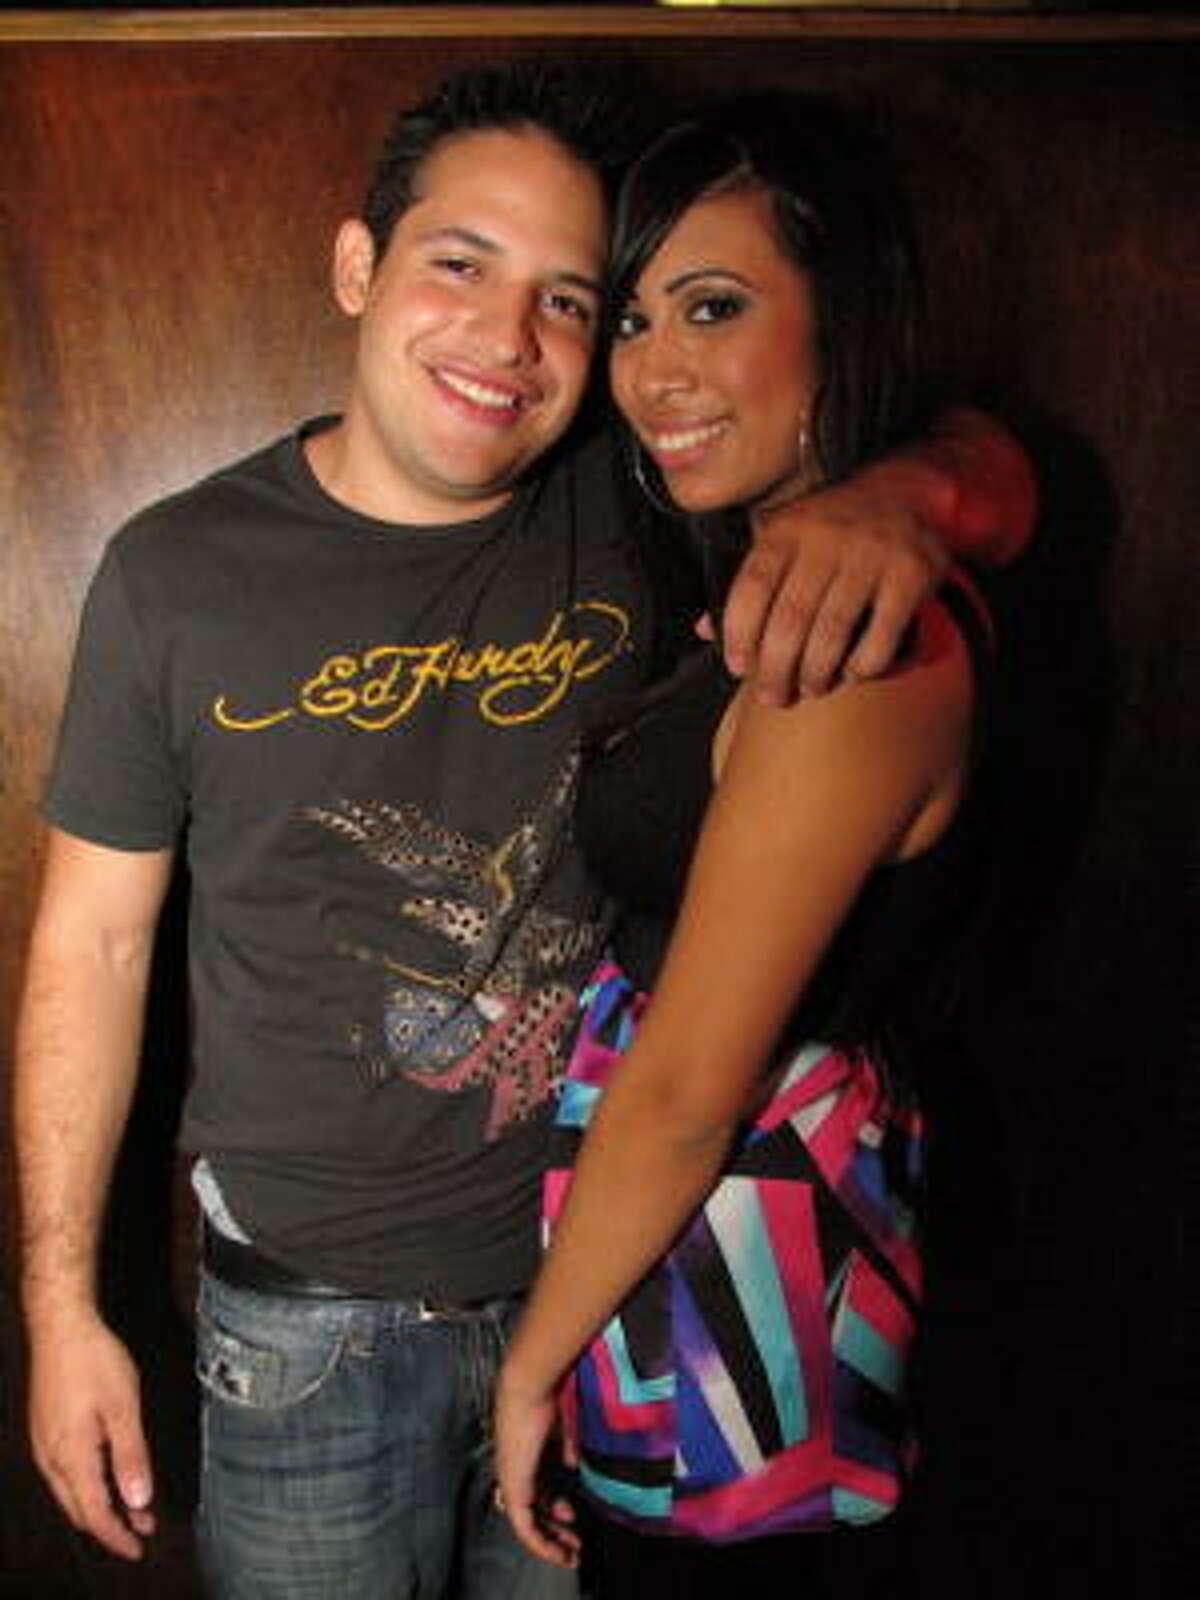 Ryan Sparrow, left, and Jessica Barrera